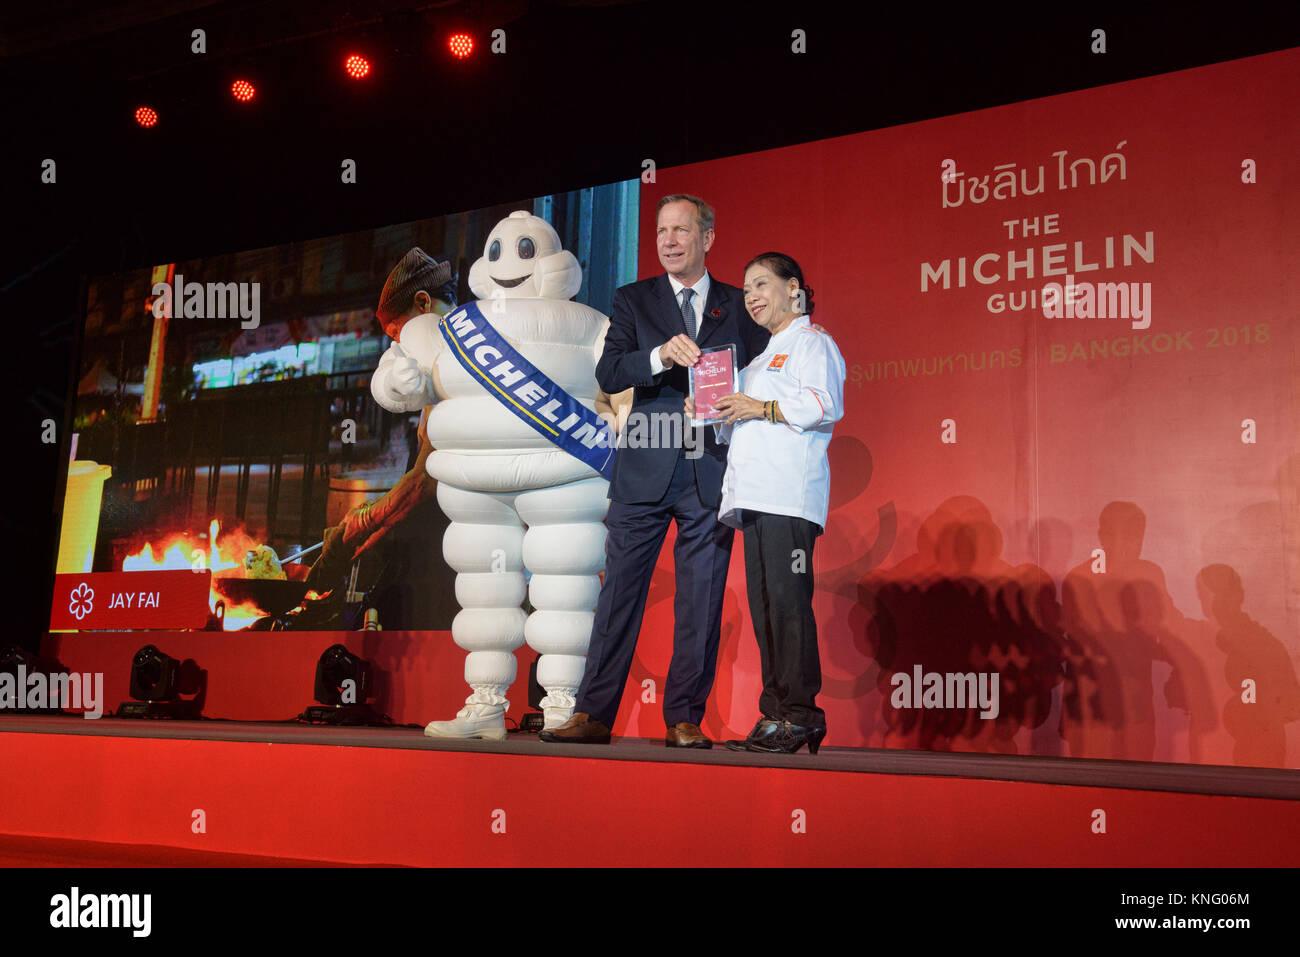 Jay Fai awarded one star by the Michelin Guide, Bangkok, Thailand Stock Photo